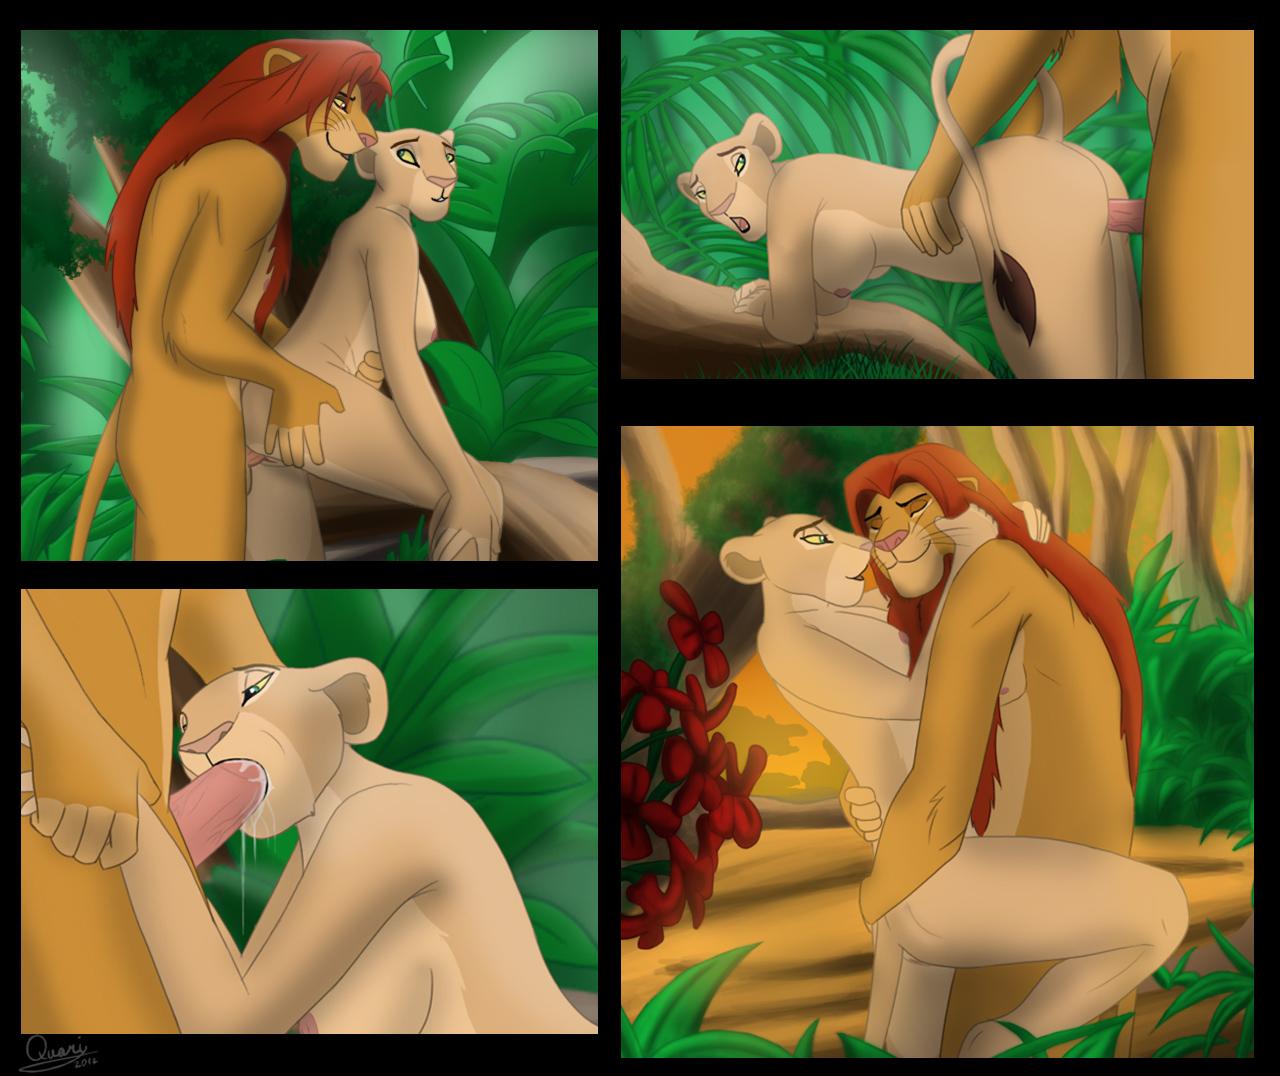 Онлайн порно сдуденти льв в